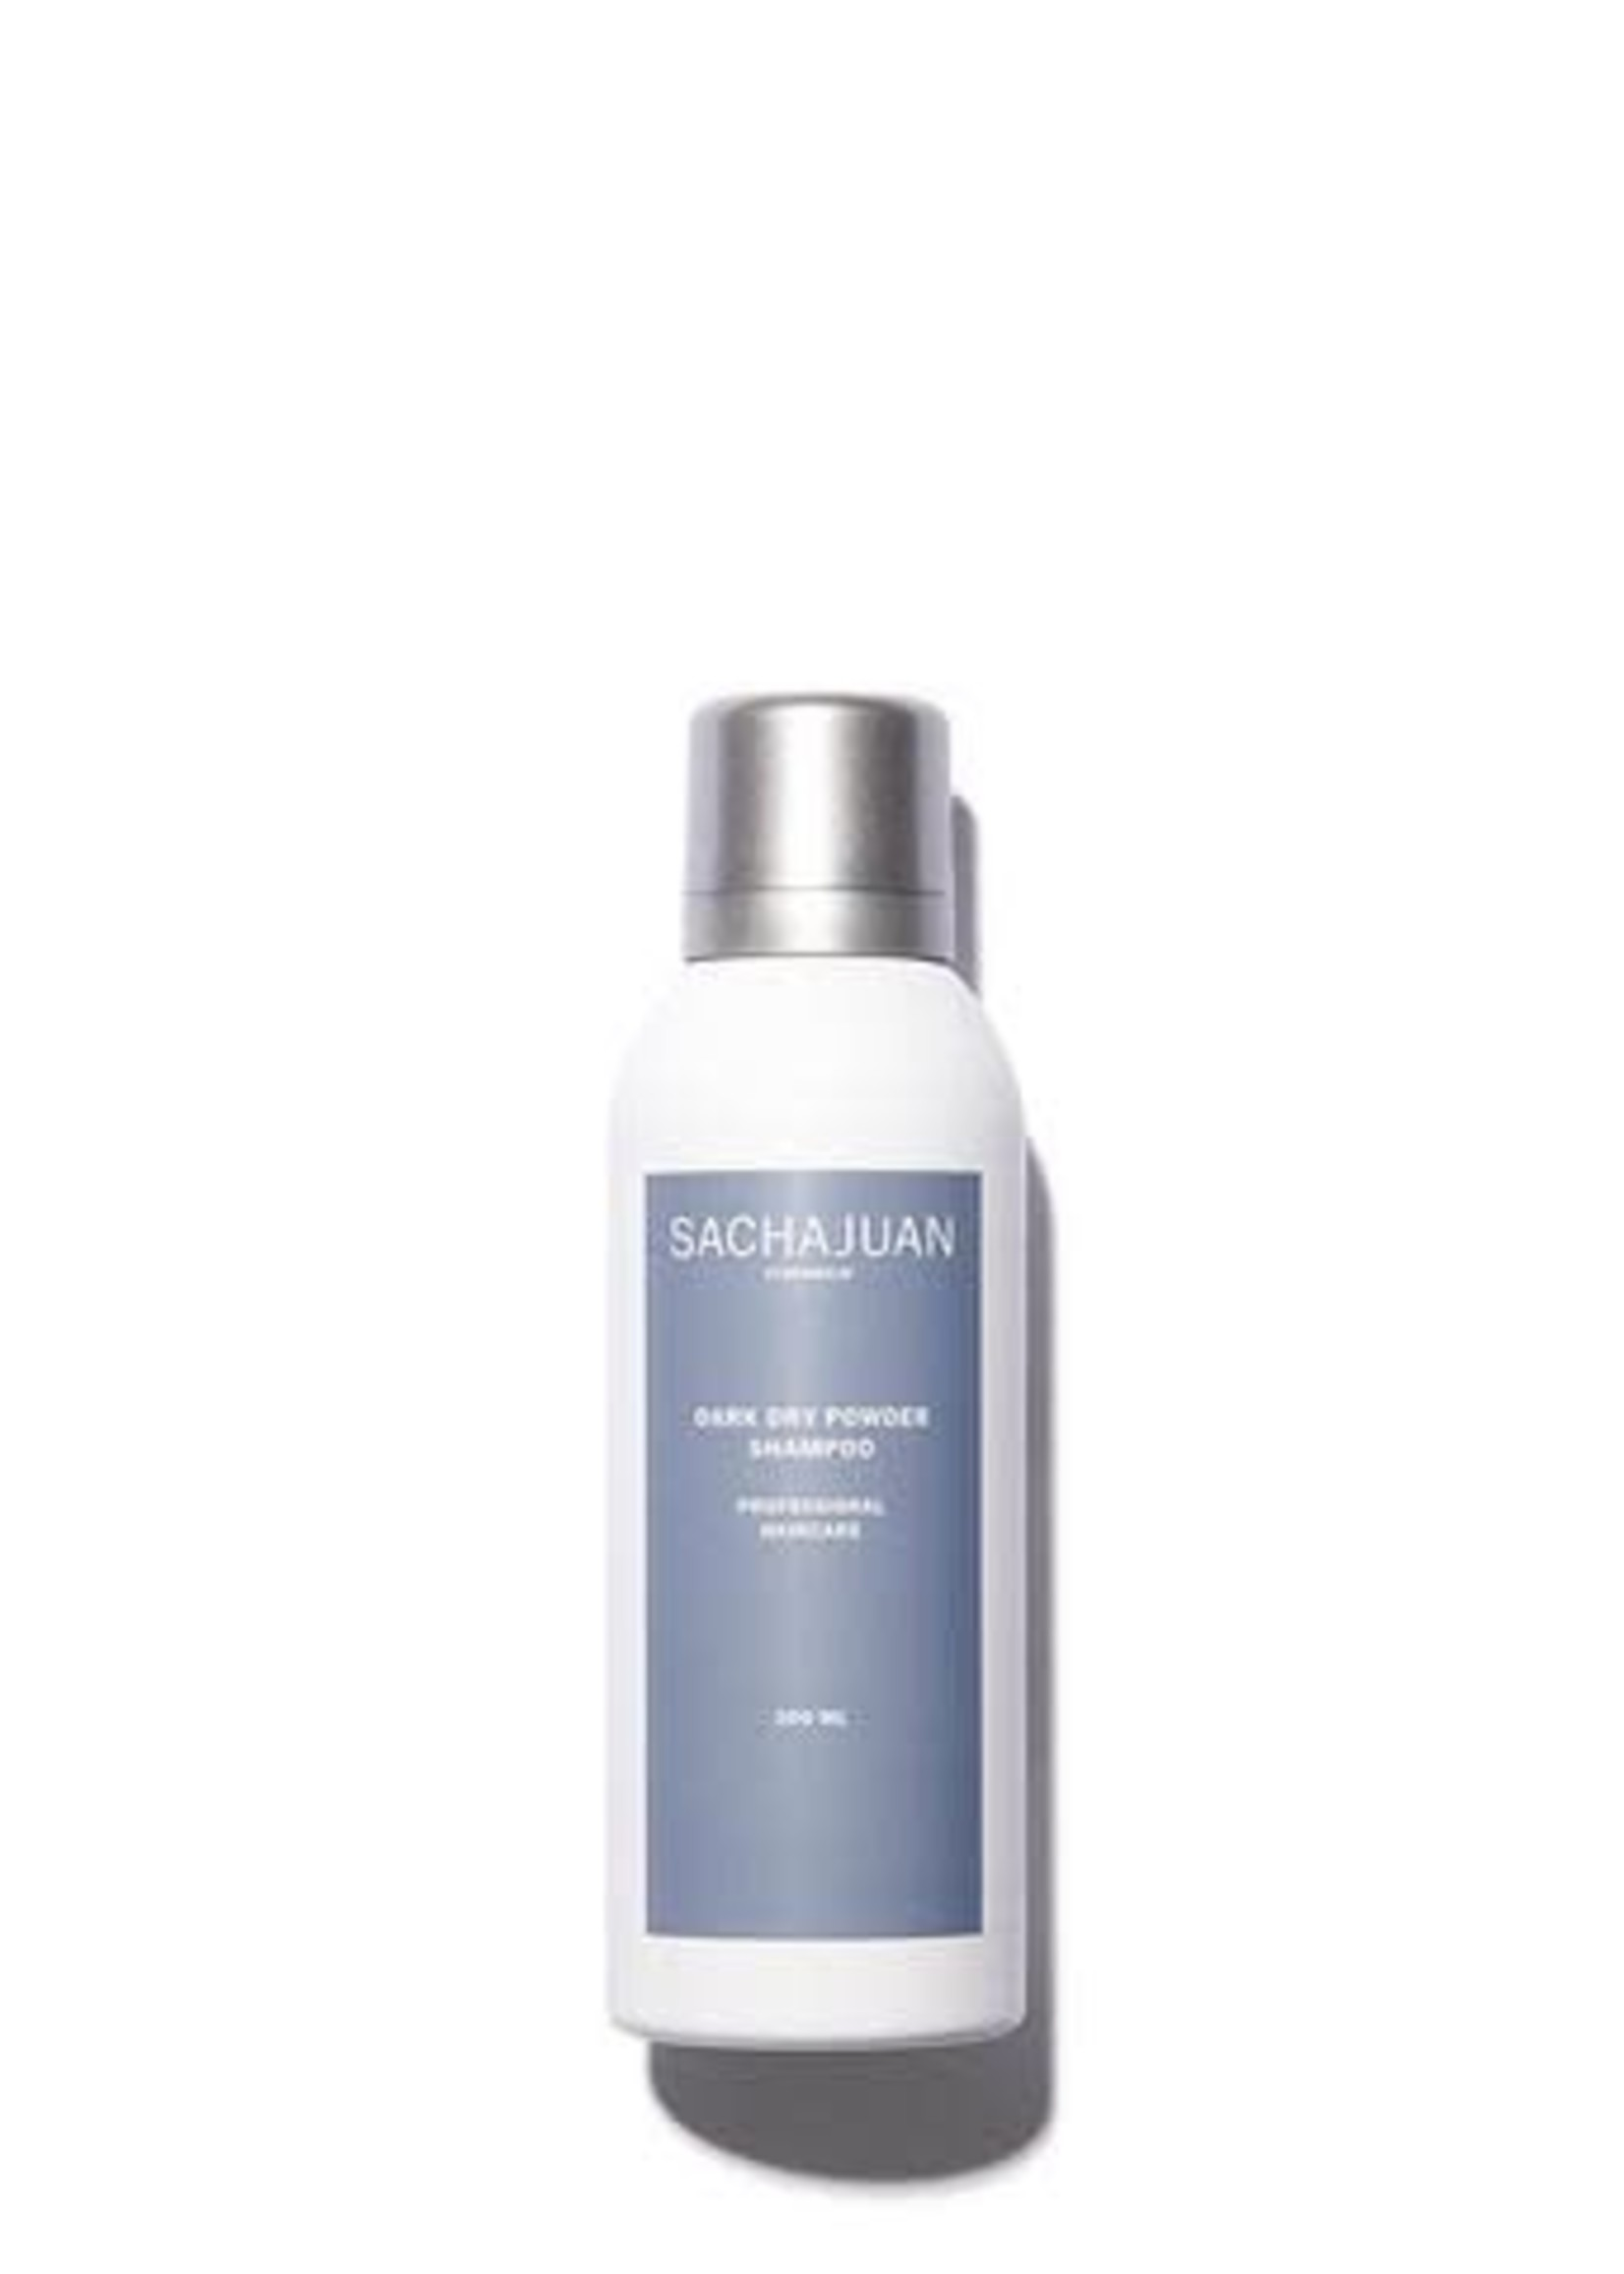 Dark Dry Powder Shampoo 200ml